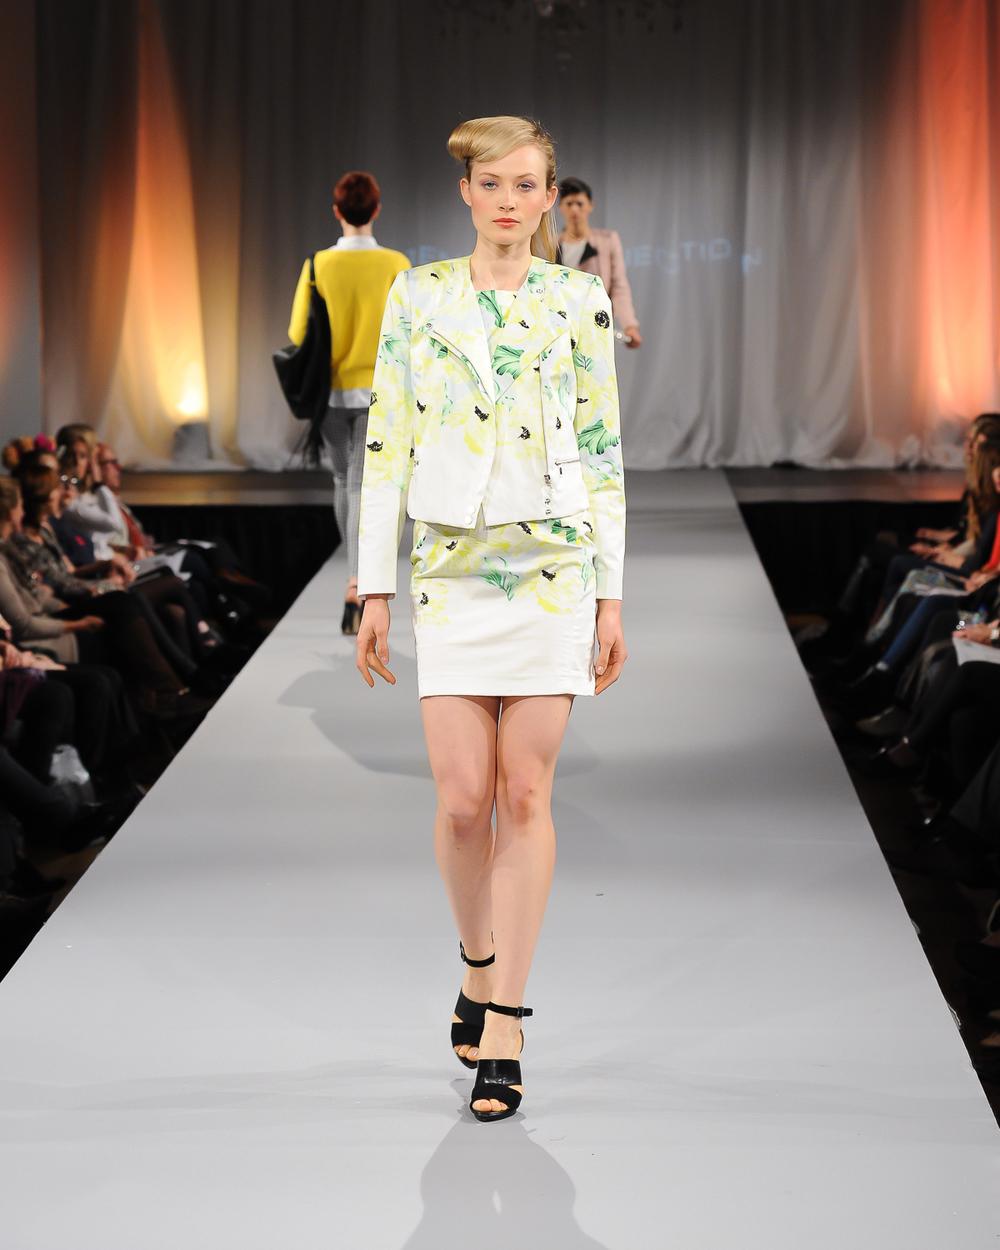 bristol-fashion-photographer-11.jpg